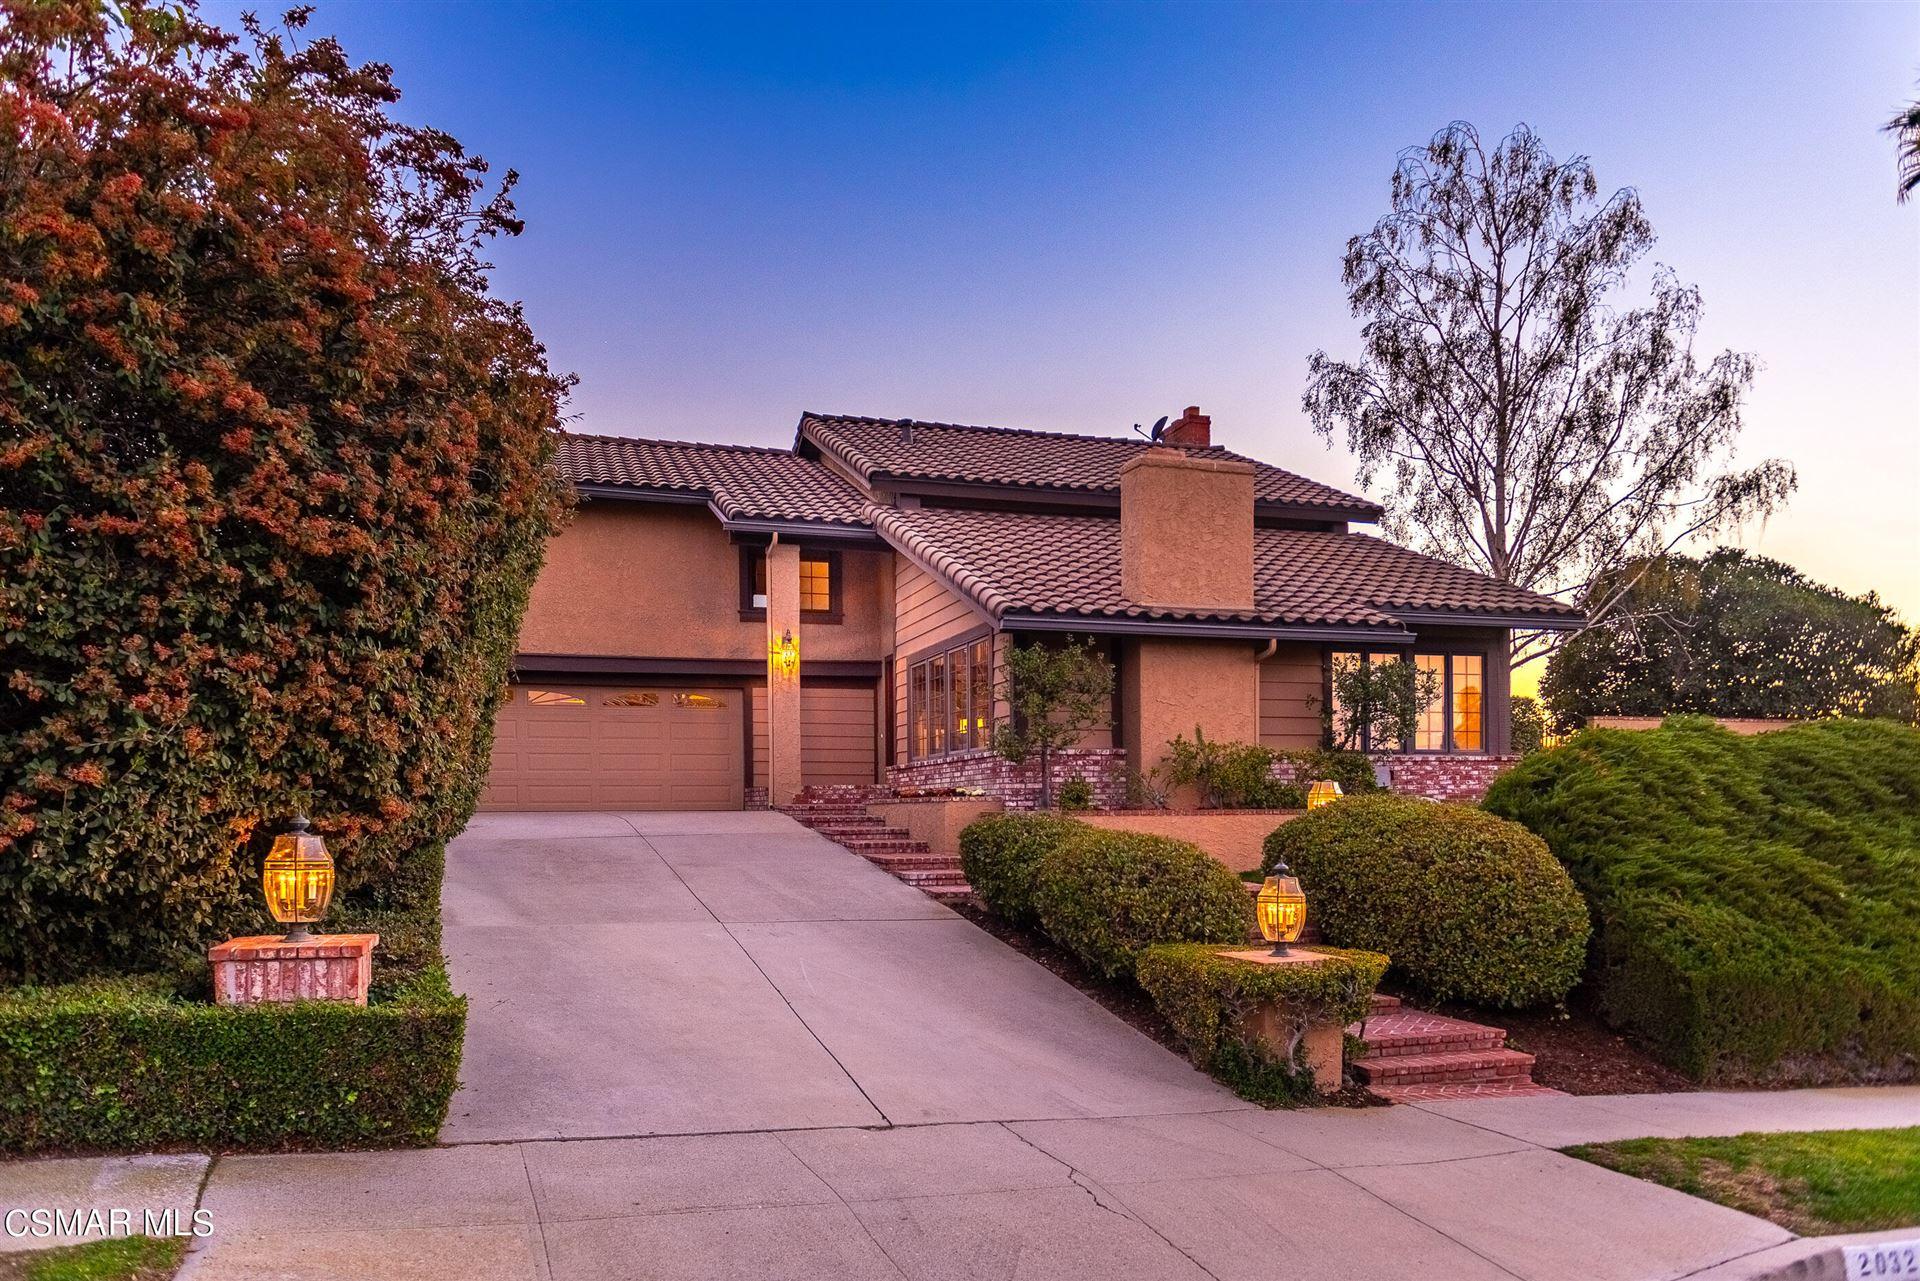 2032 Mccrea Road, Thousand Oaks, CA 91362 - MLS#: 221005642